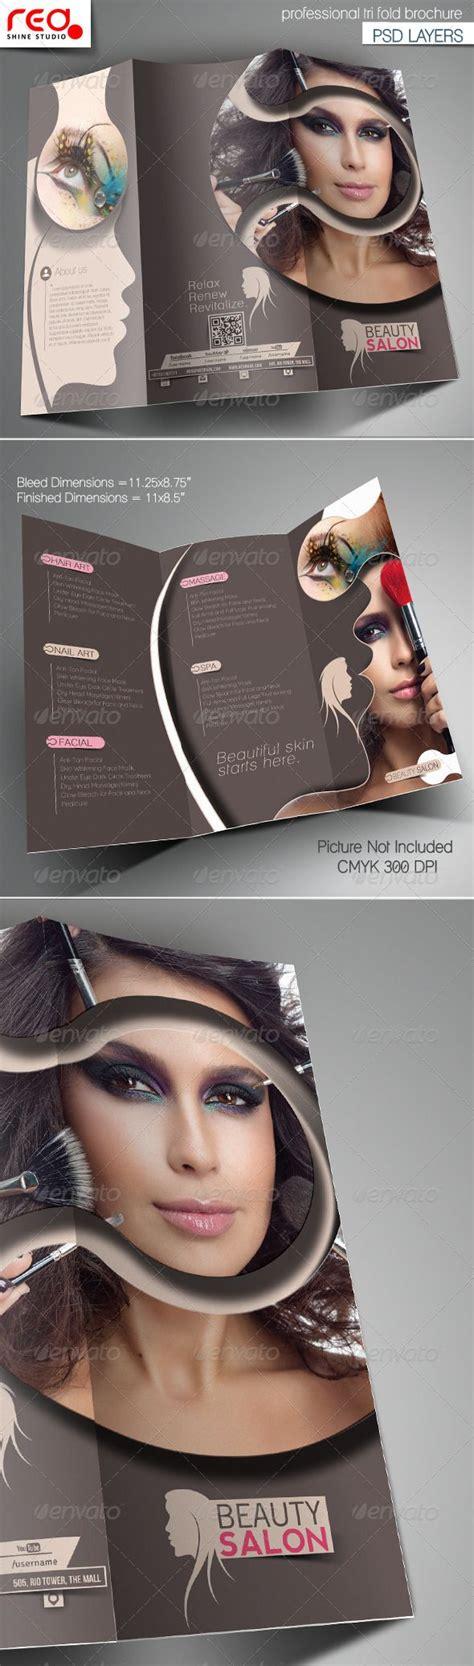 brochure templates buy beauty salon promotion trifold brochure template stuff